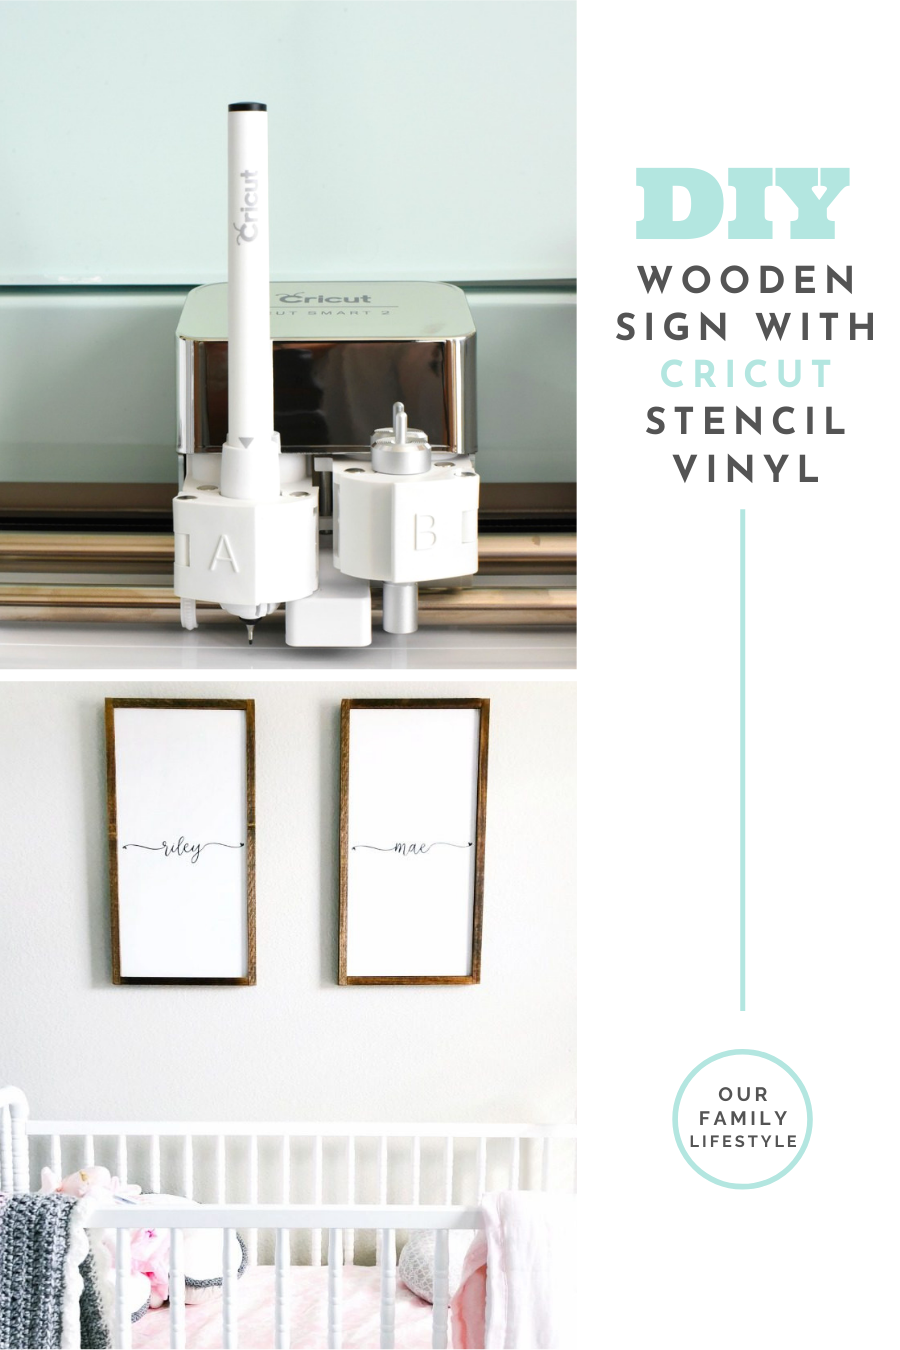 DIY Wooden Sign with Cricut Stencil Vinyl